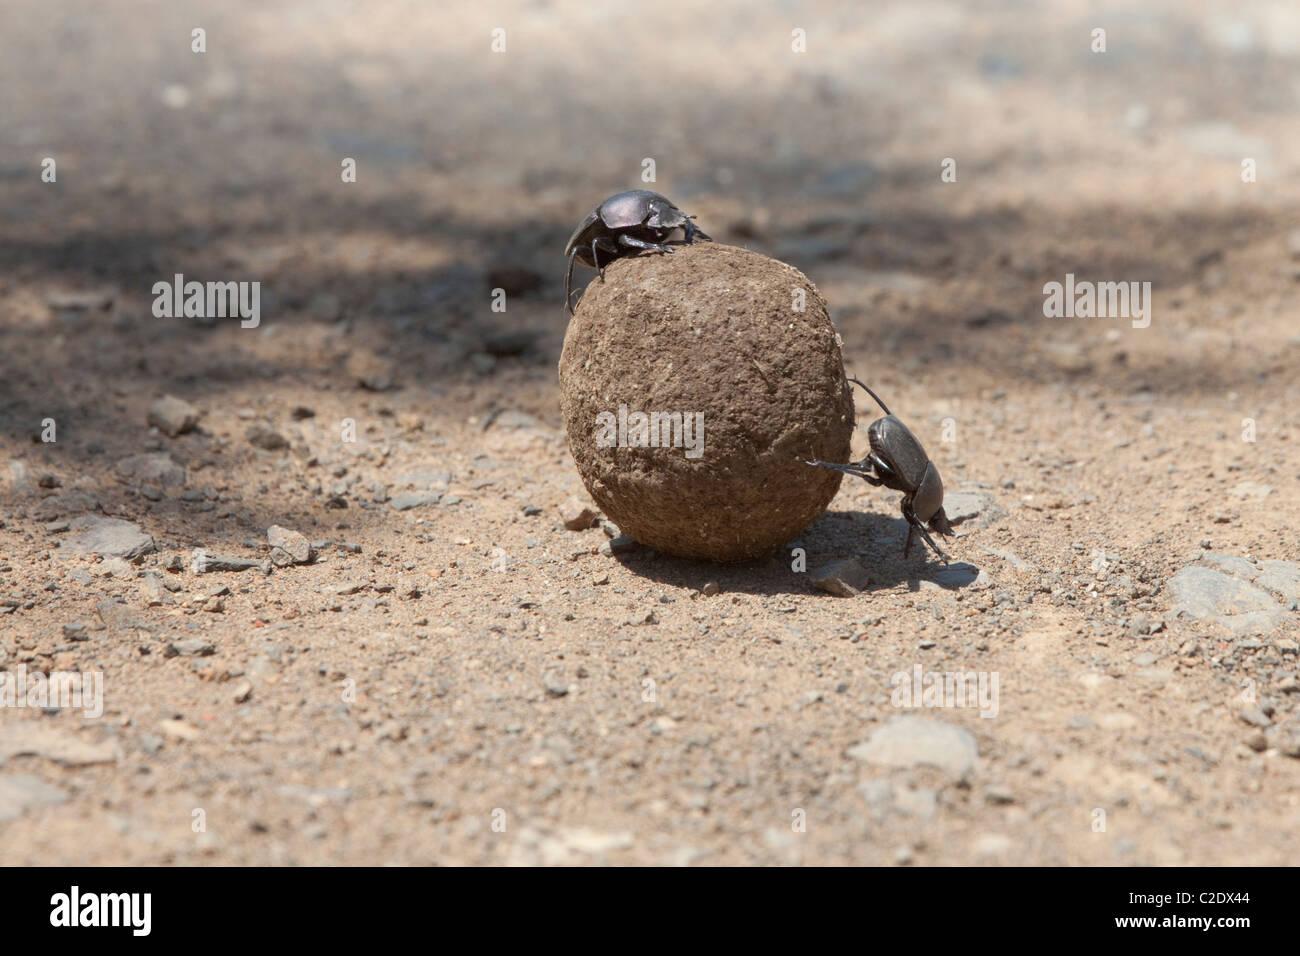 Flattened Giant Dungbeetle (Pachylomerus Femoralis) - Stock Image